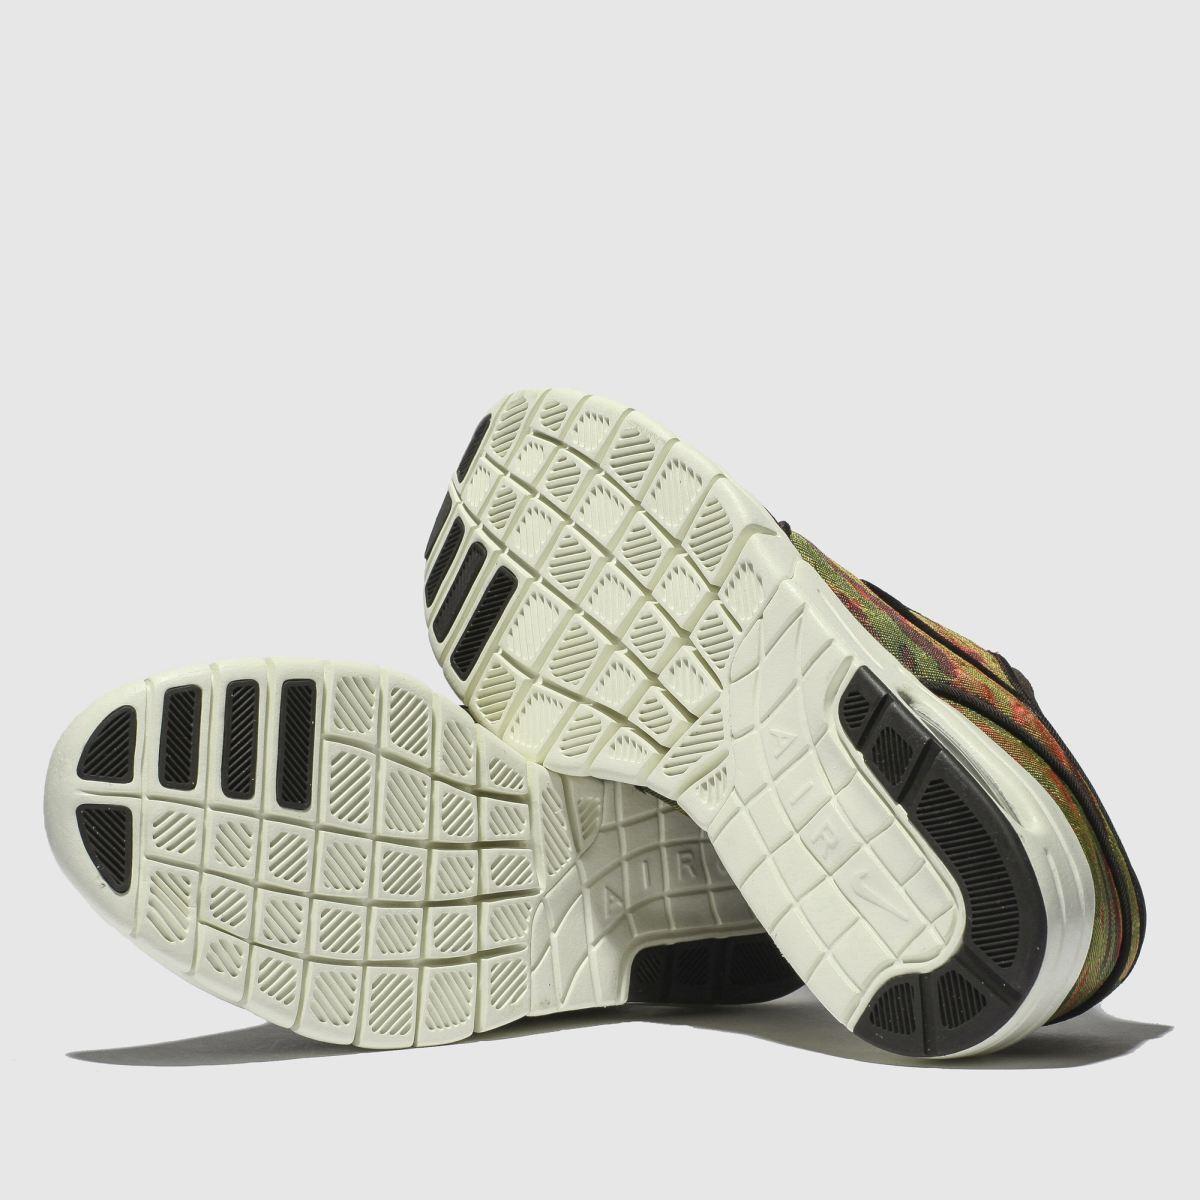 Nike Rubber Stefan Janoski Max Trainers